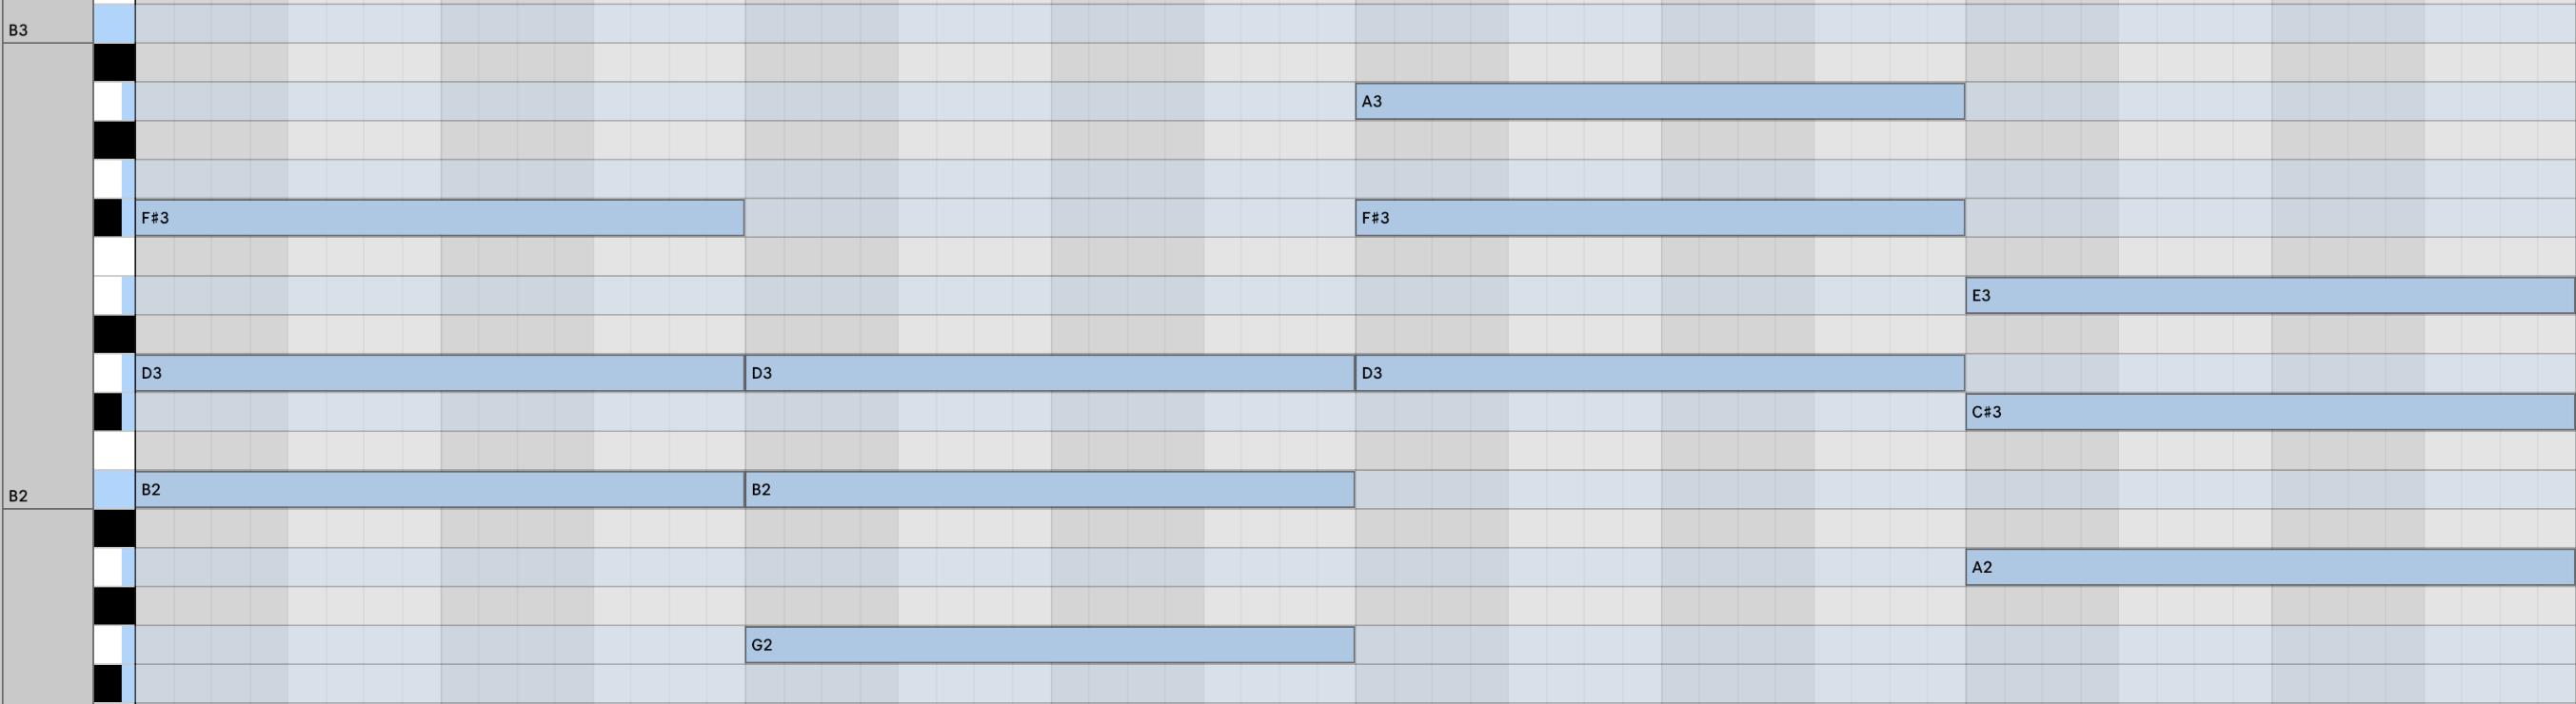 chord progression (i VI III VII)